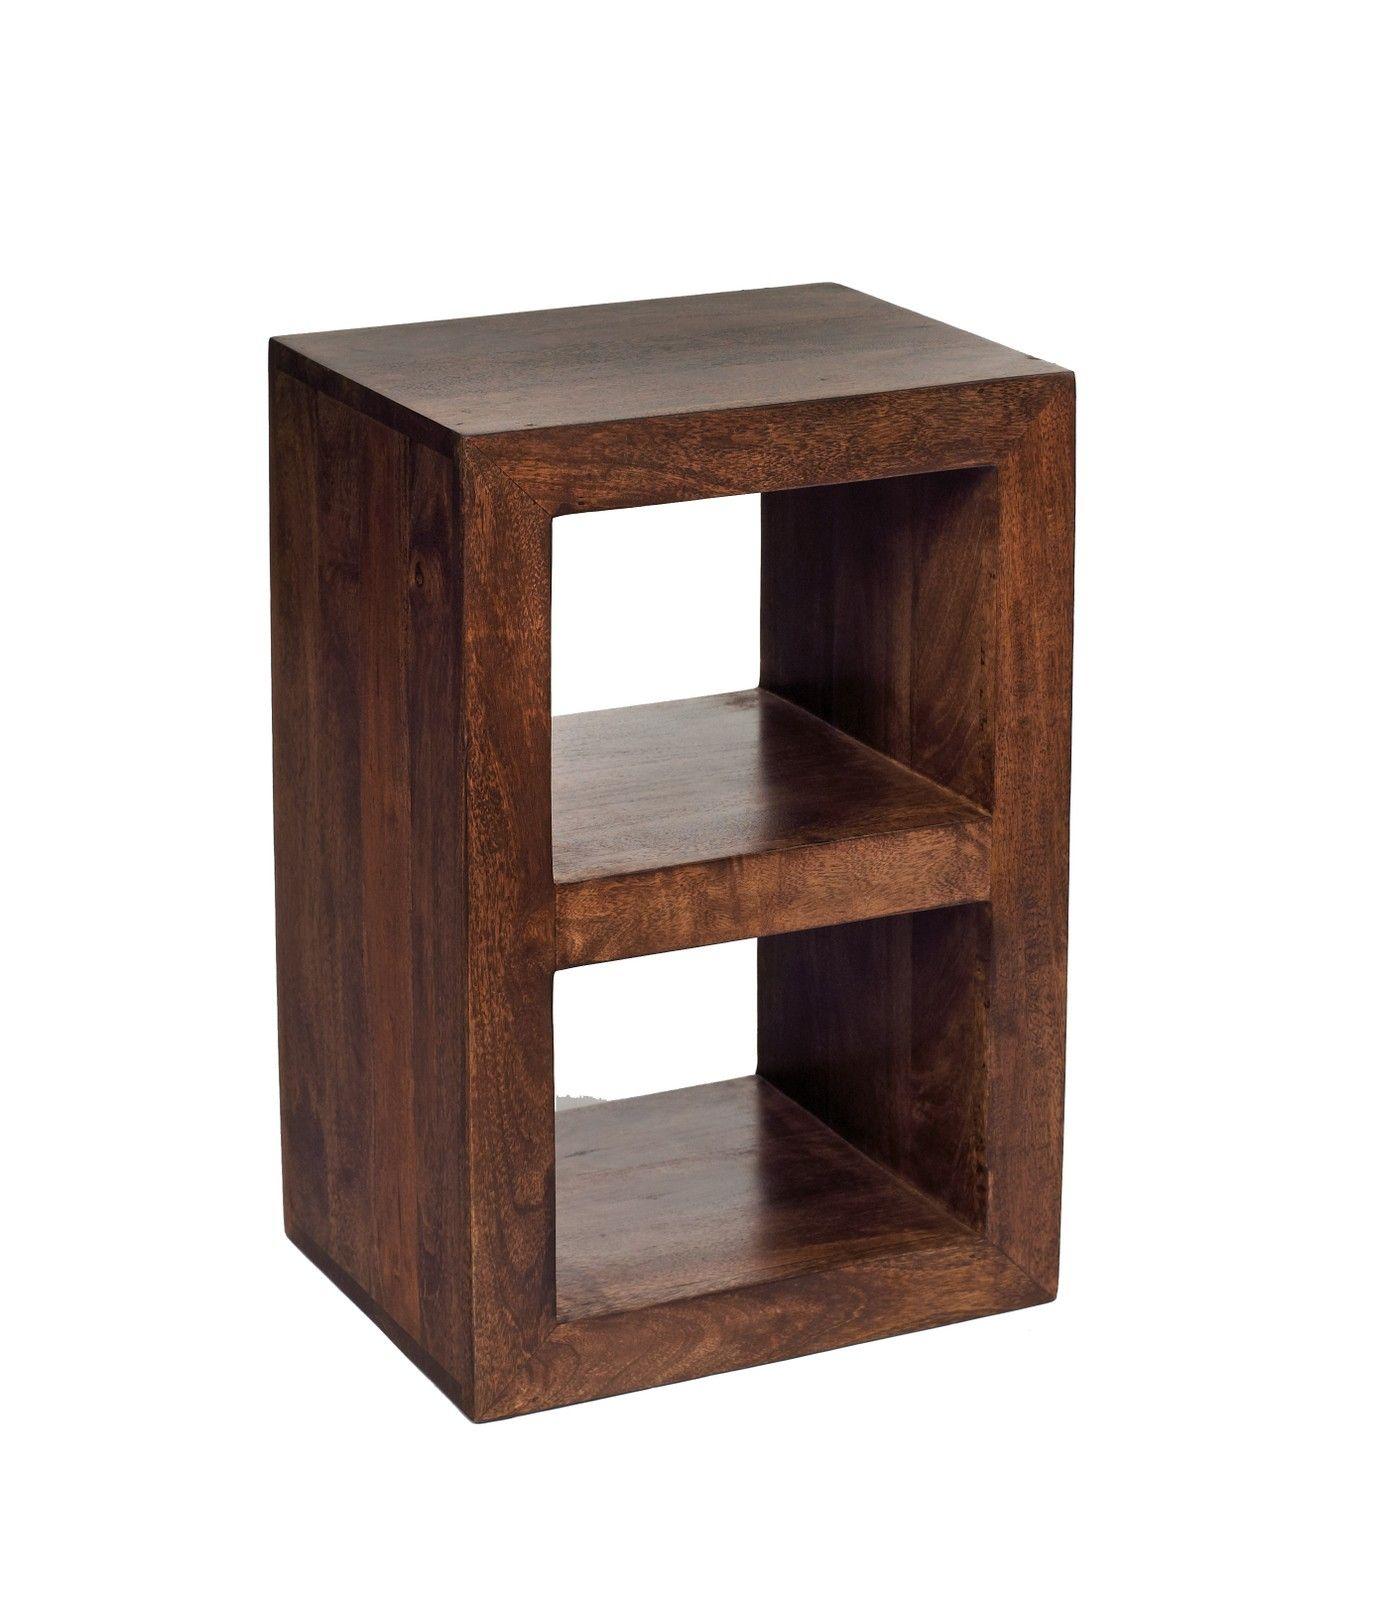 wood furniture pics. wood cubes furniture. high quality indian furniture, sheesham, mango, rosewood furniture pics